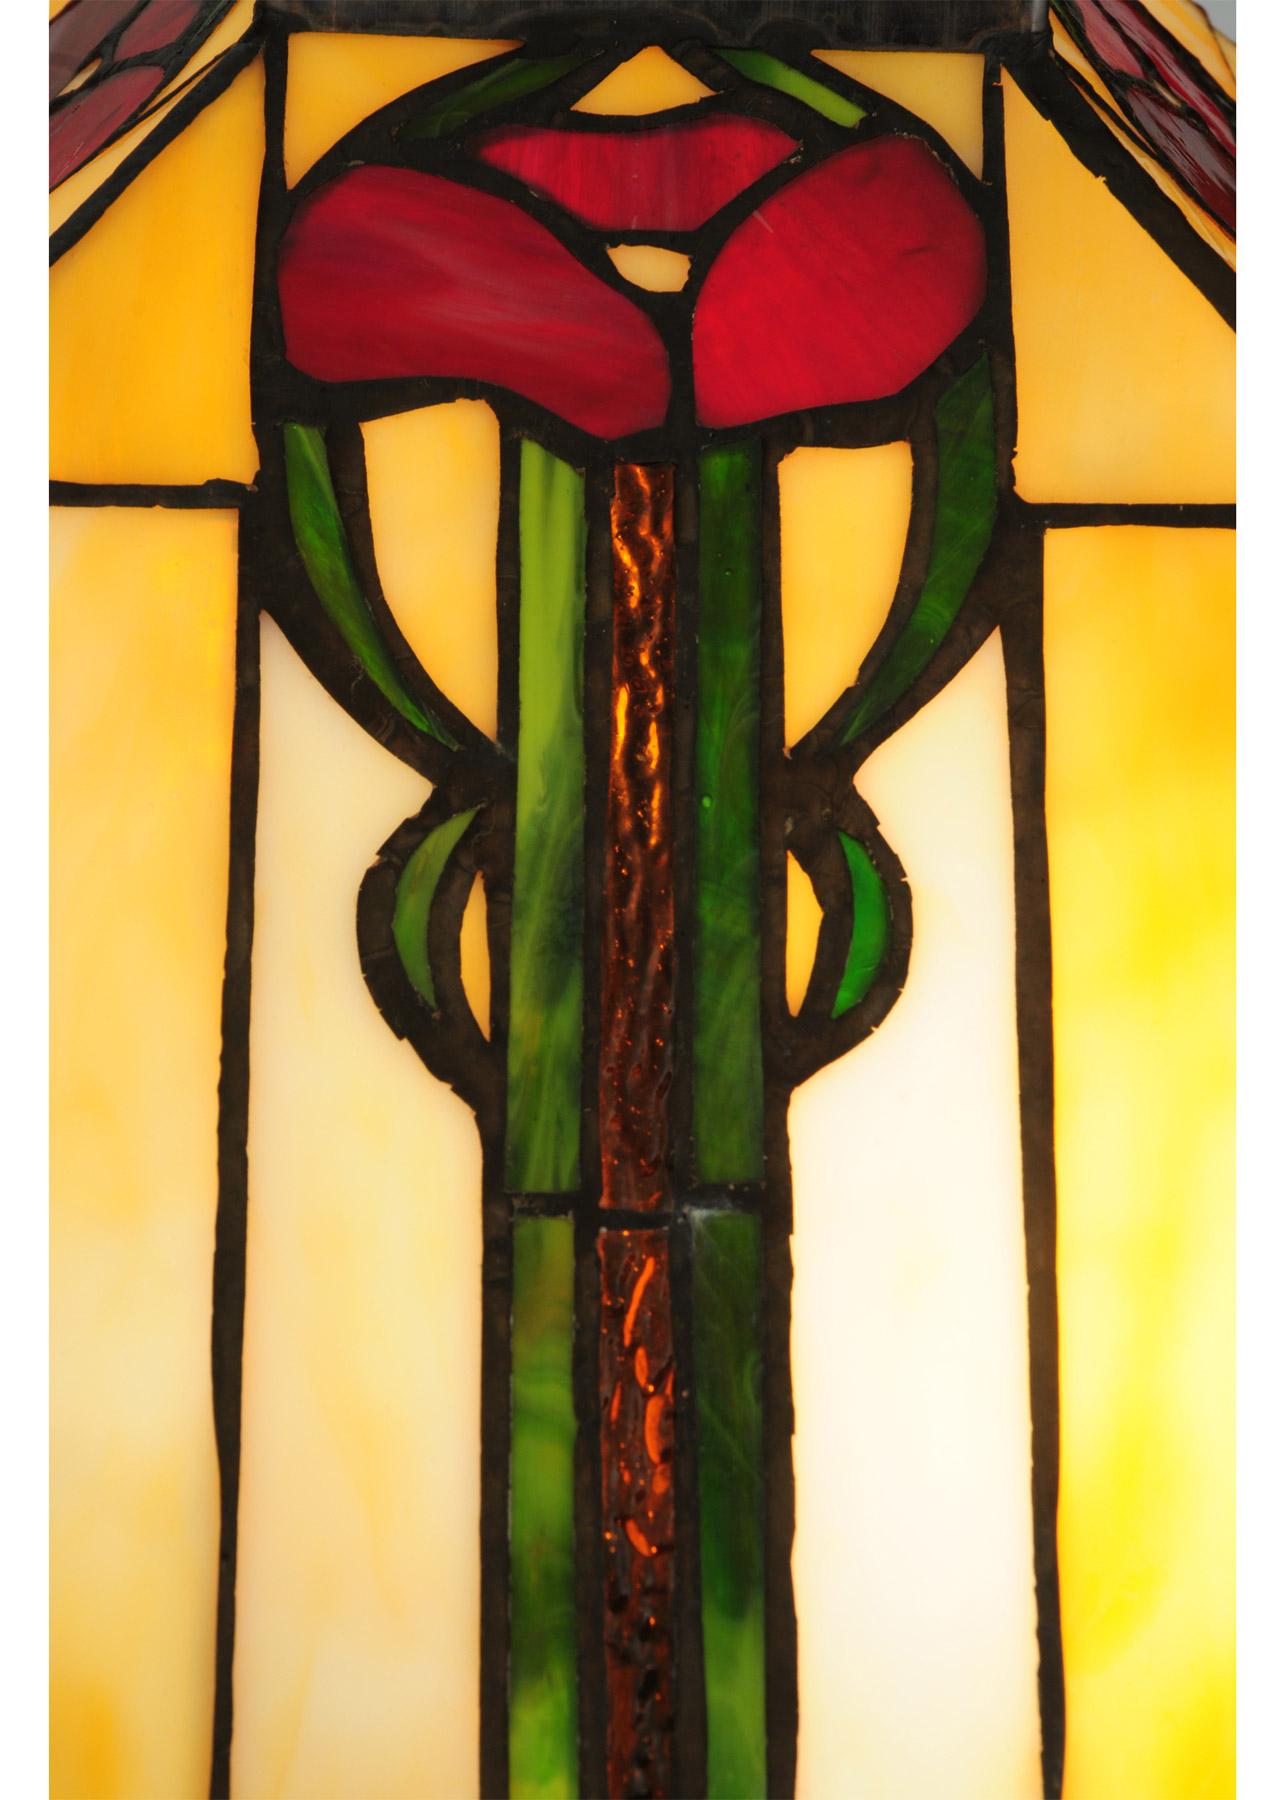 Meyda 138117 Parker Poppy Table Lamp